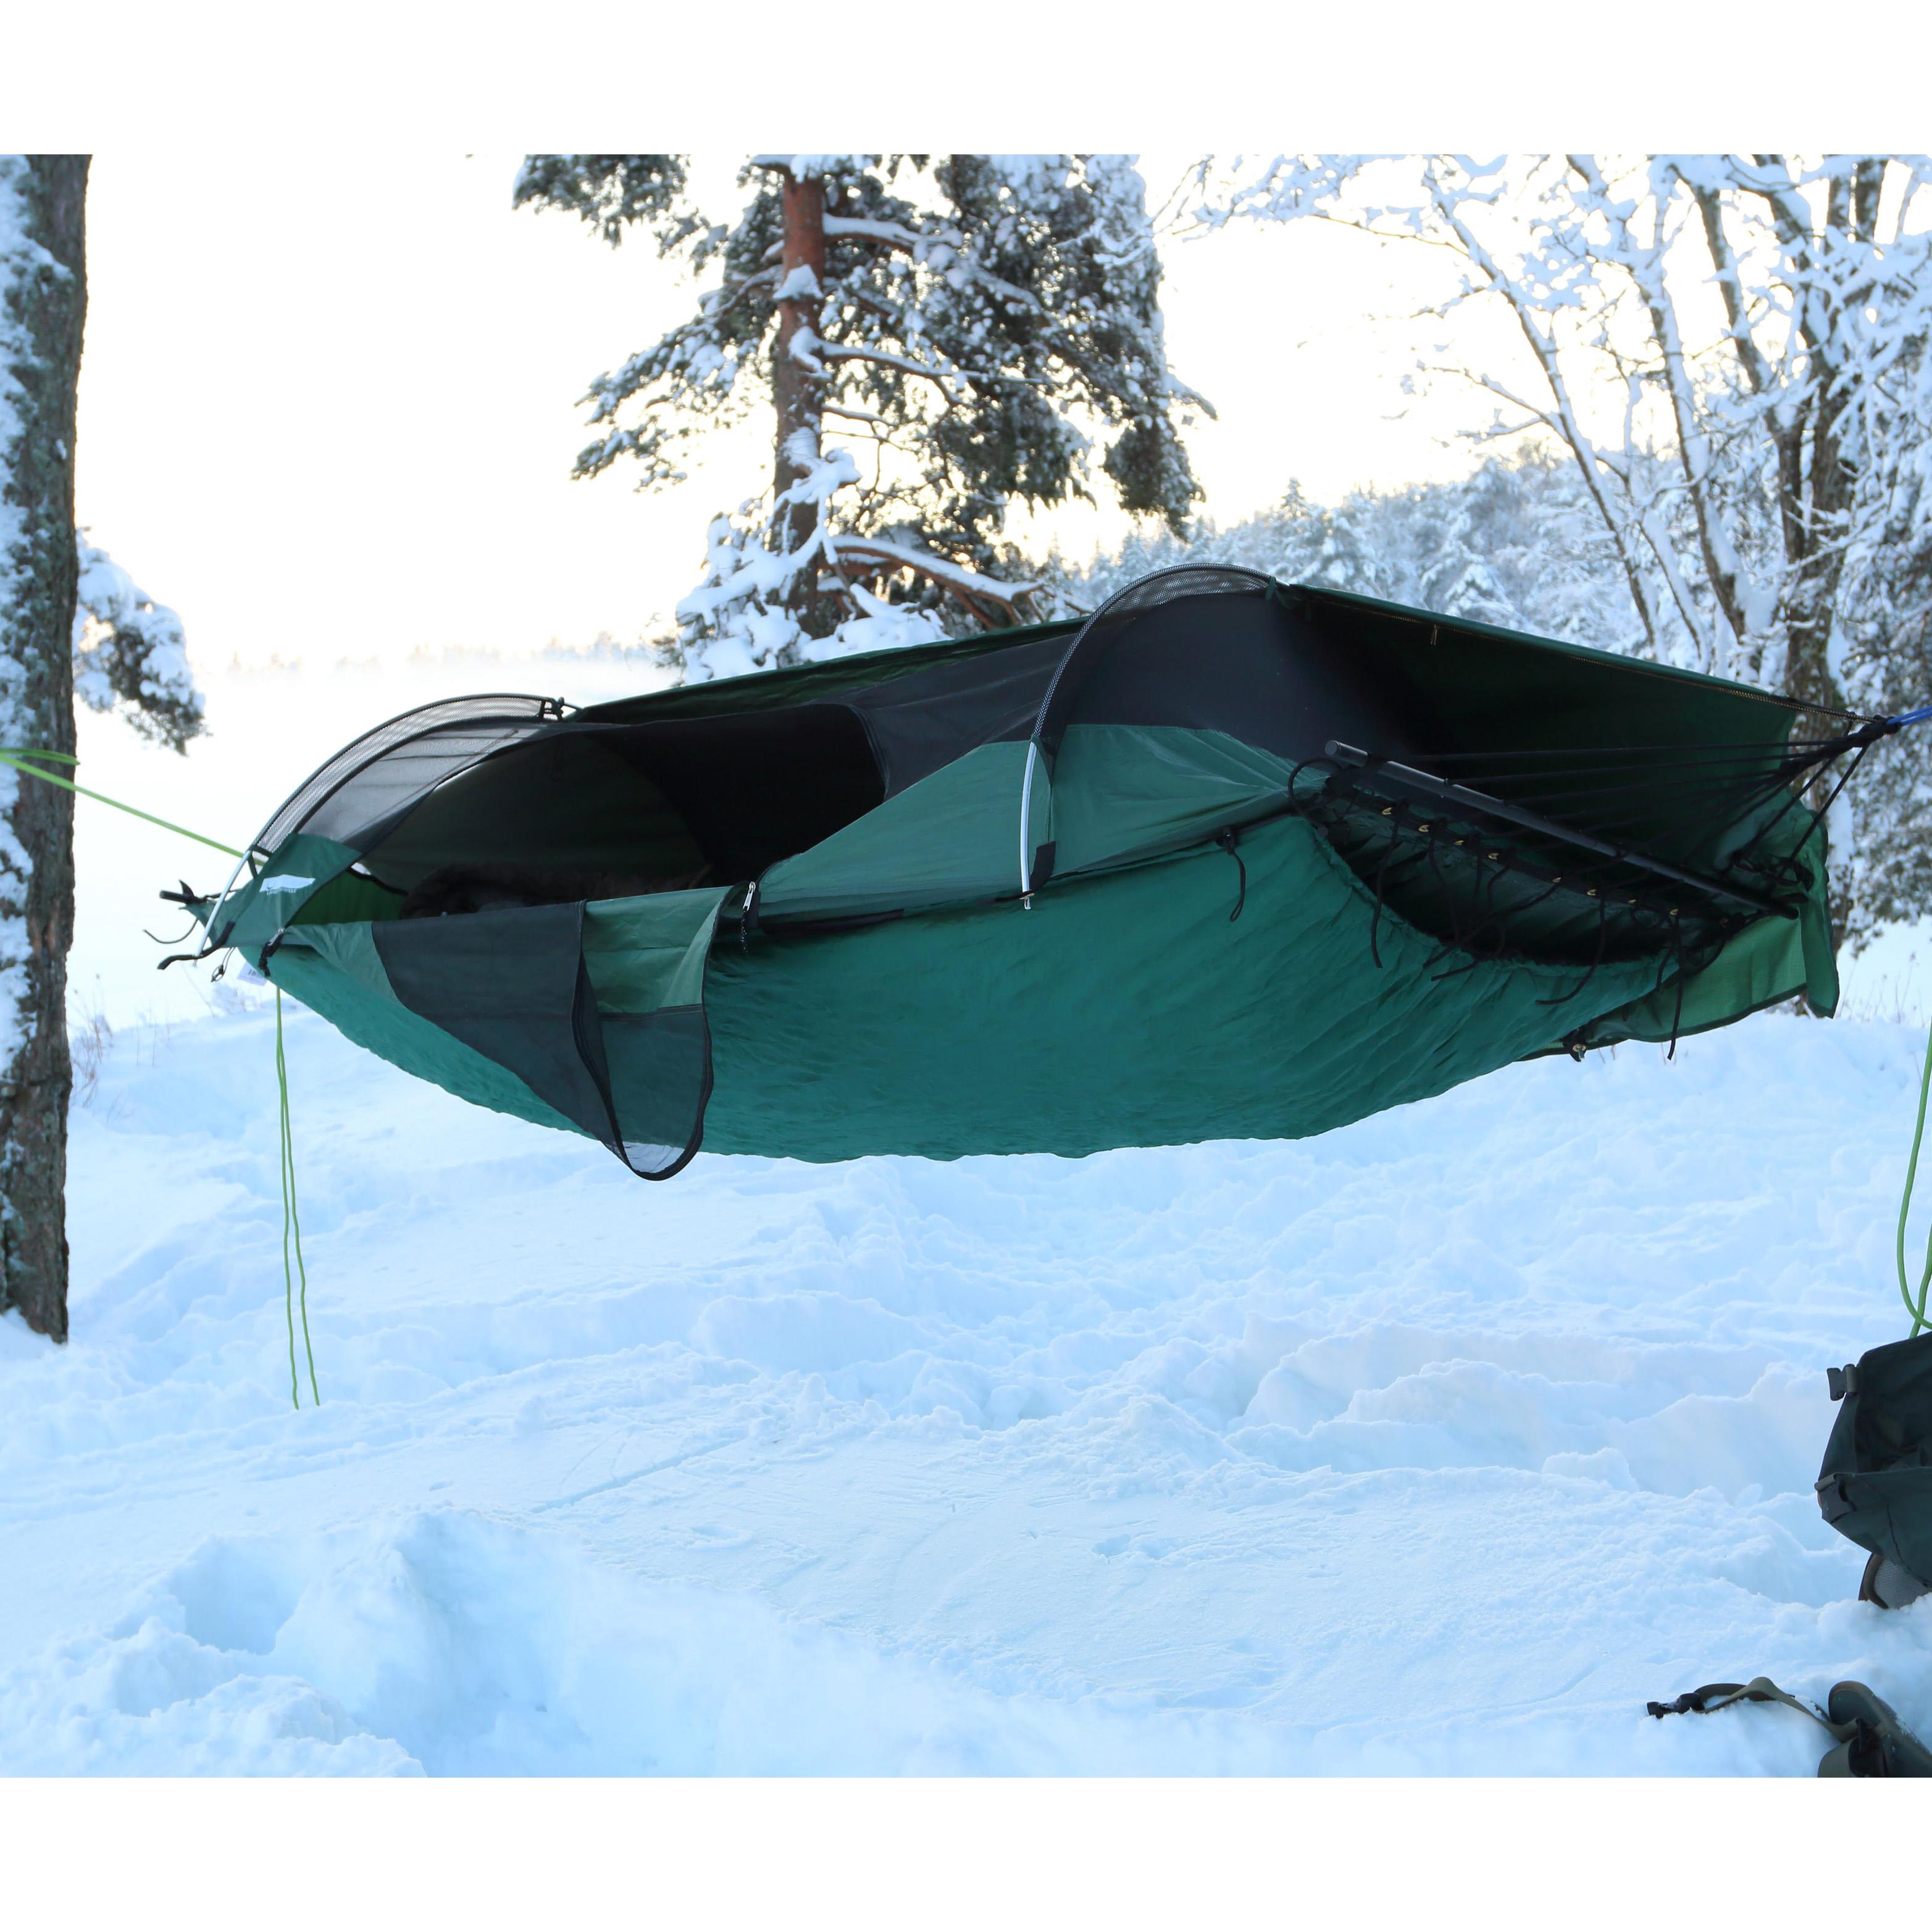 lawson hammock underquilt snow